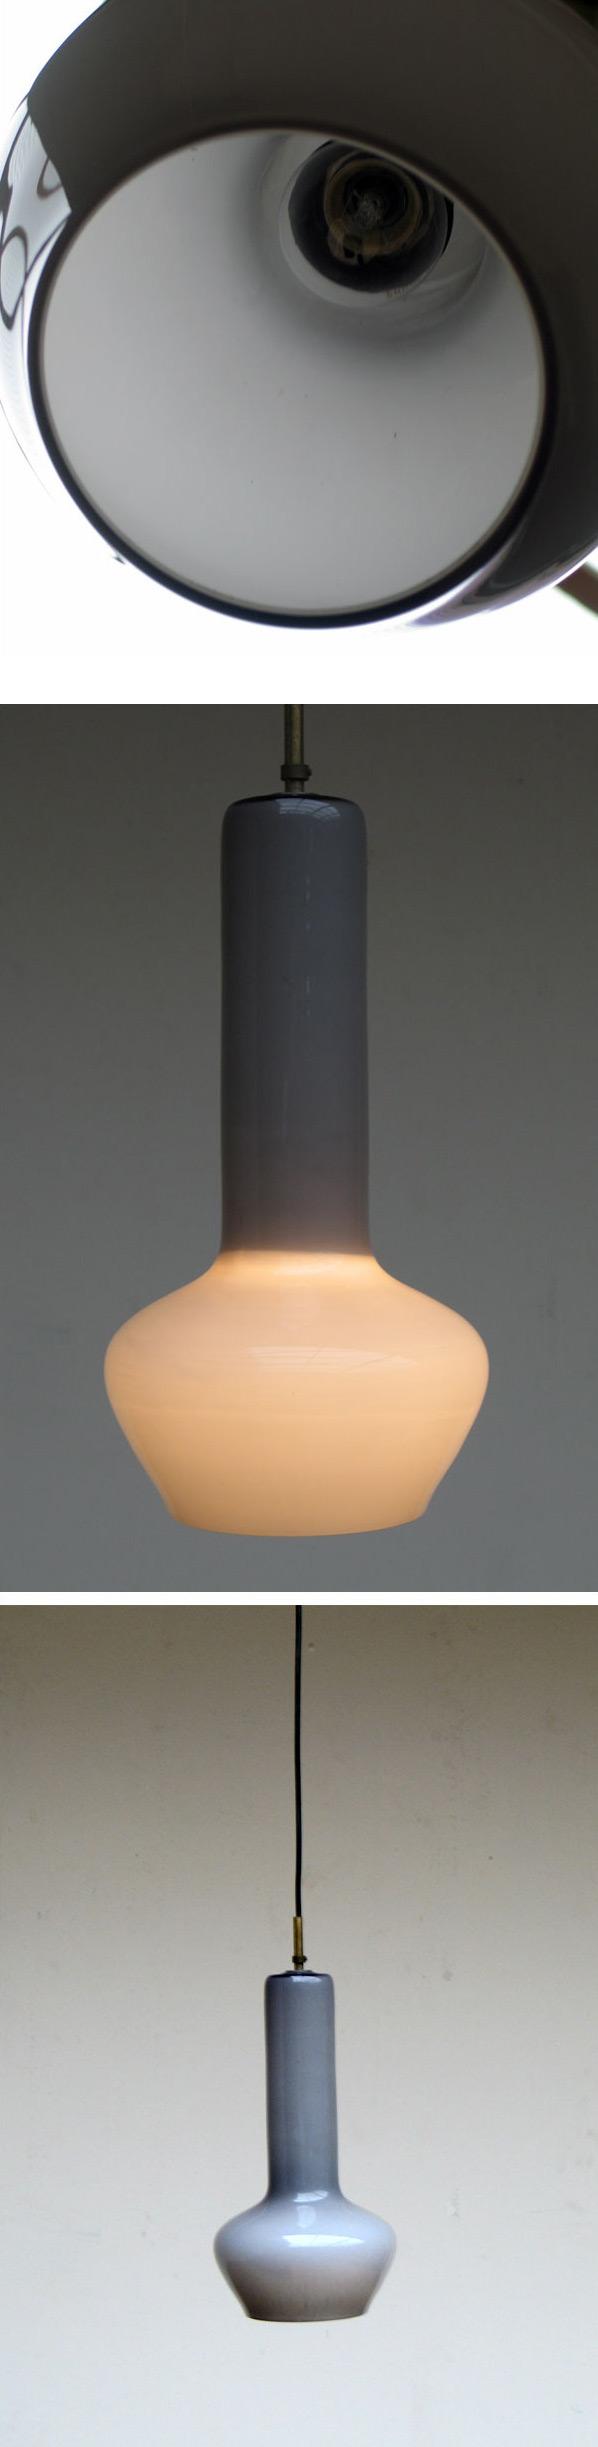 Glass Vistosi ceiling lamp eames era Murano Venni 1970 Large